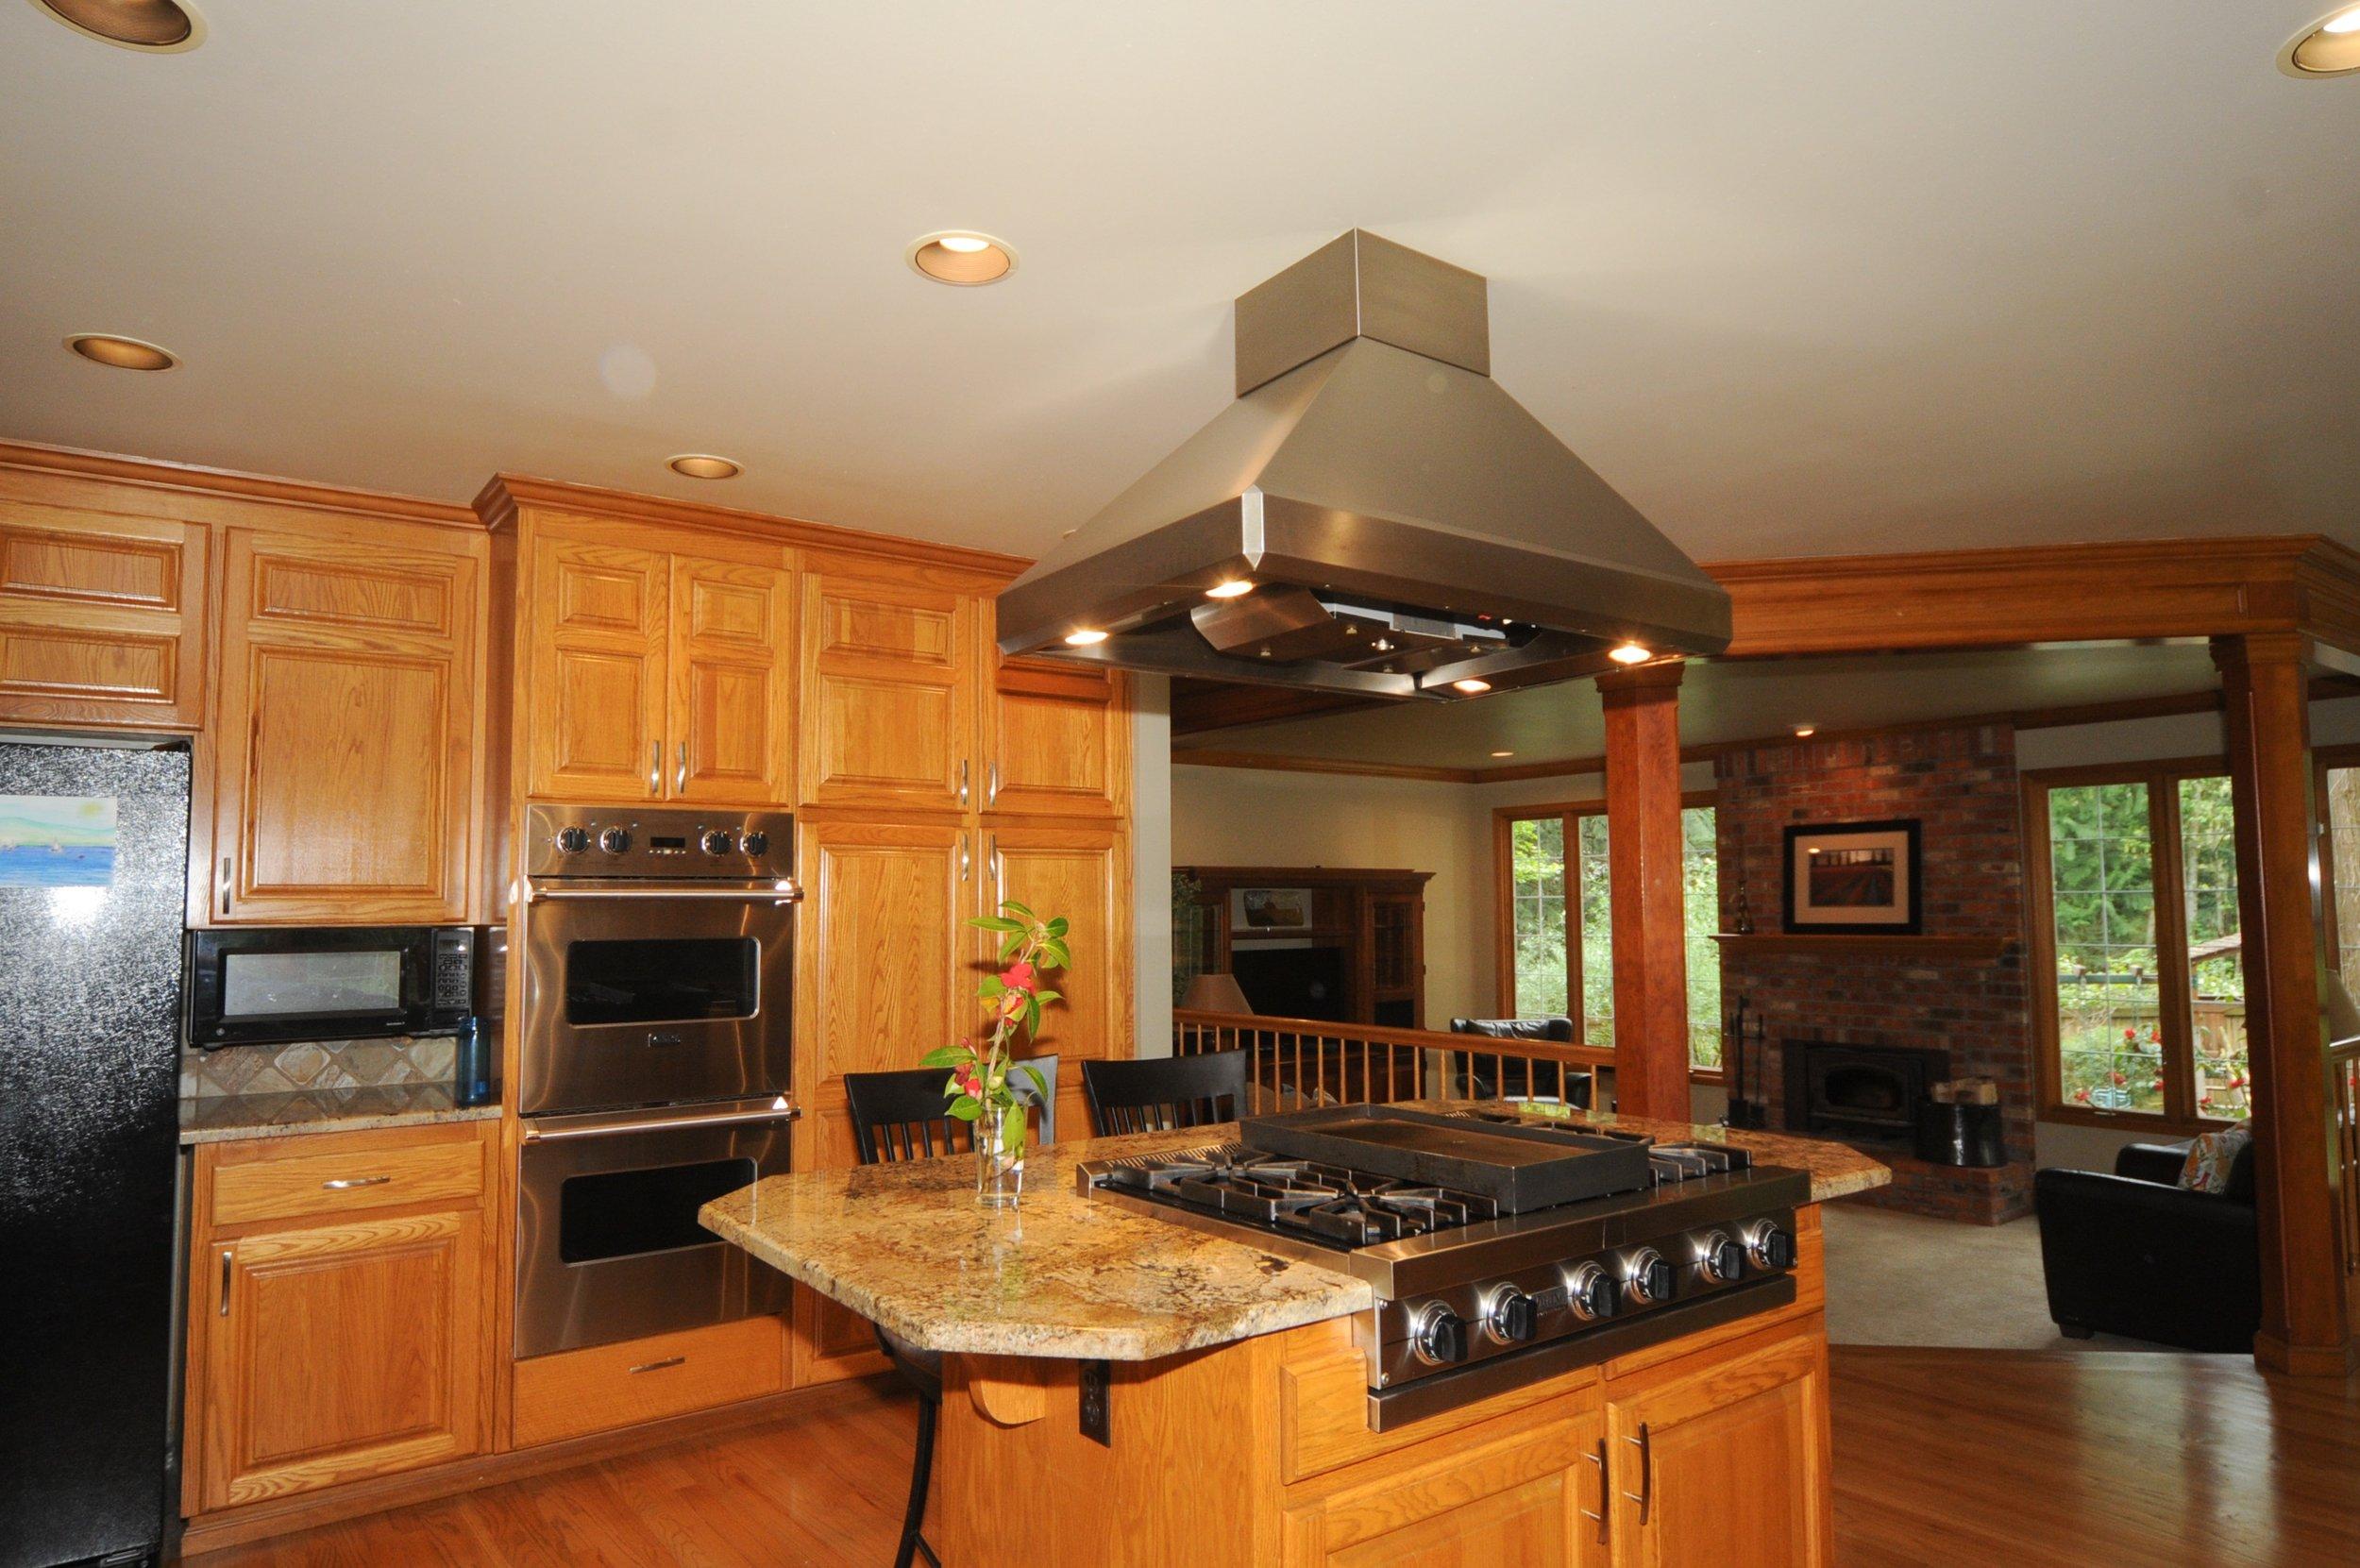 redmond_buchan_kitchen-family room.jpg